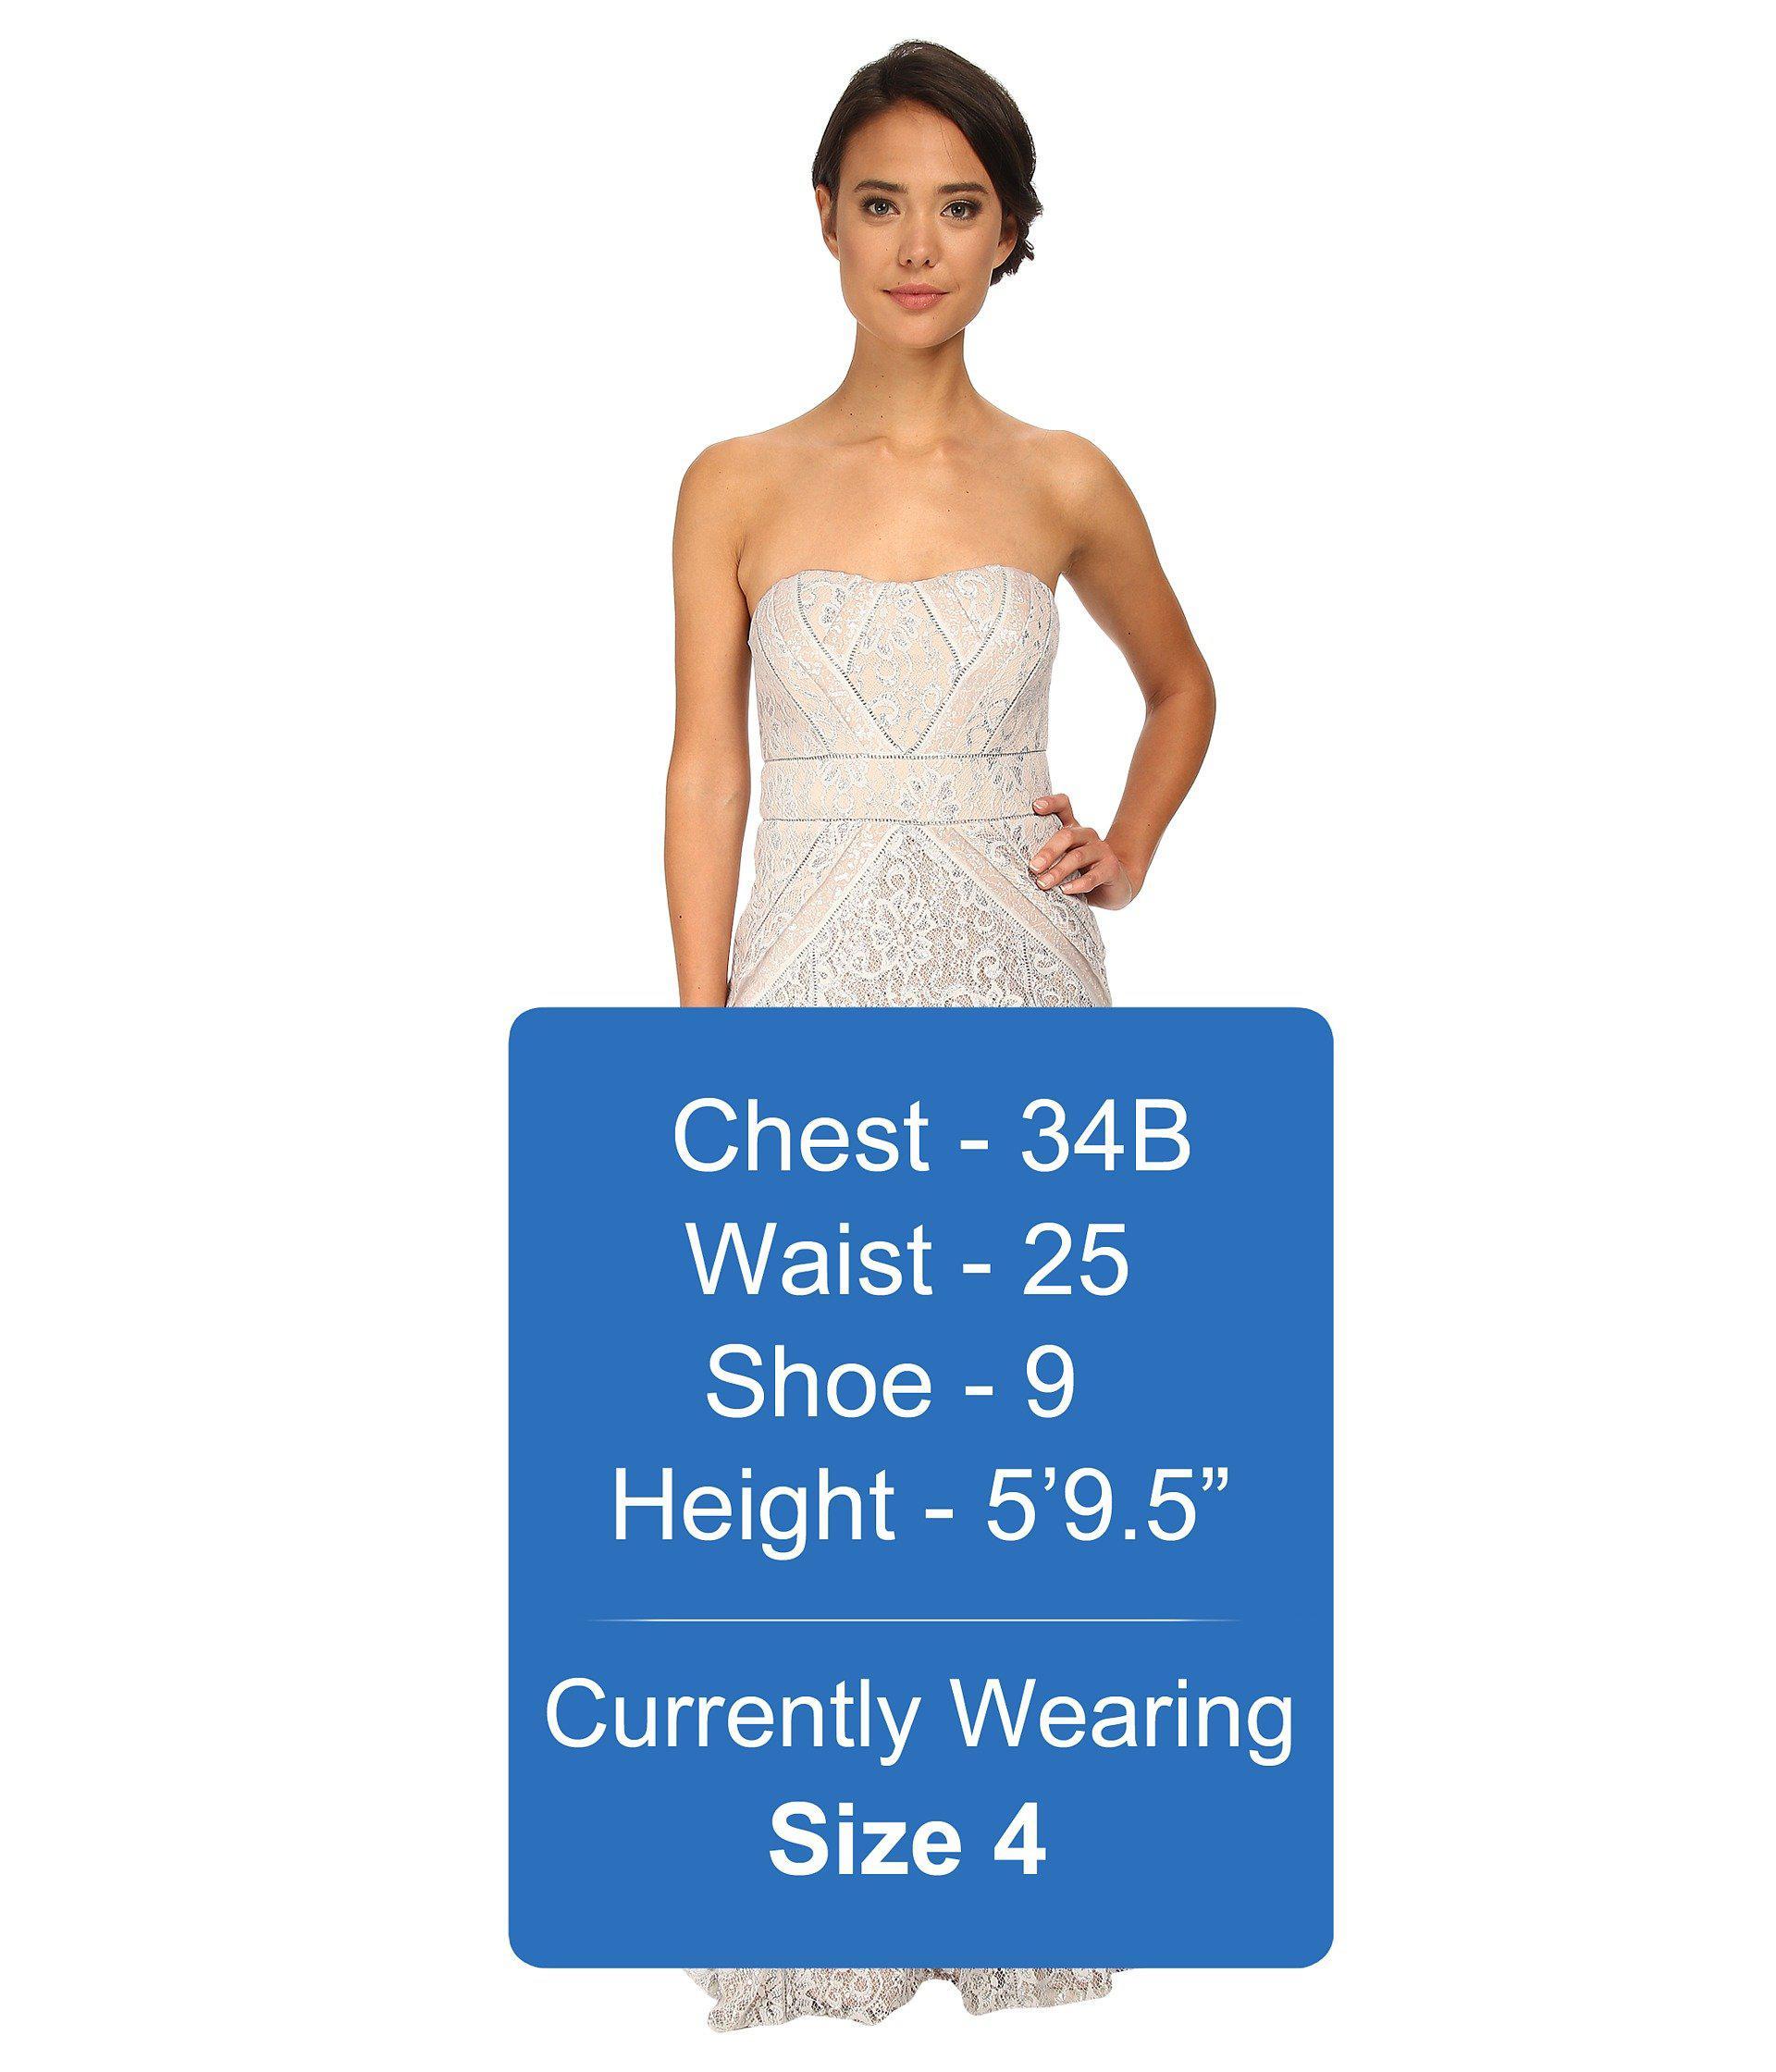 5248227a6b9c Badgley Mischka Strapless Metallic Lace Runway Gown in Metallic - Lyst